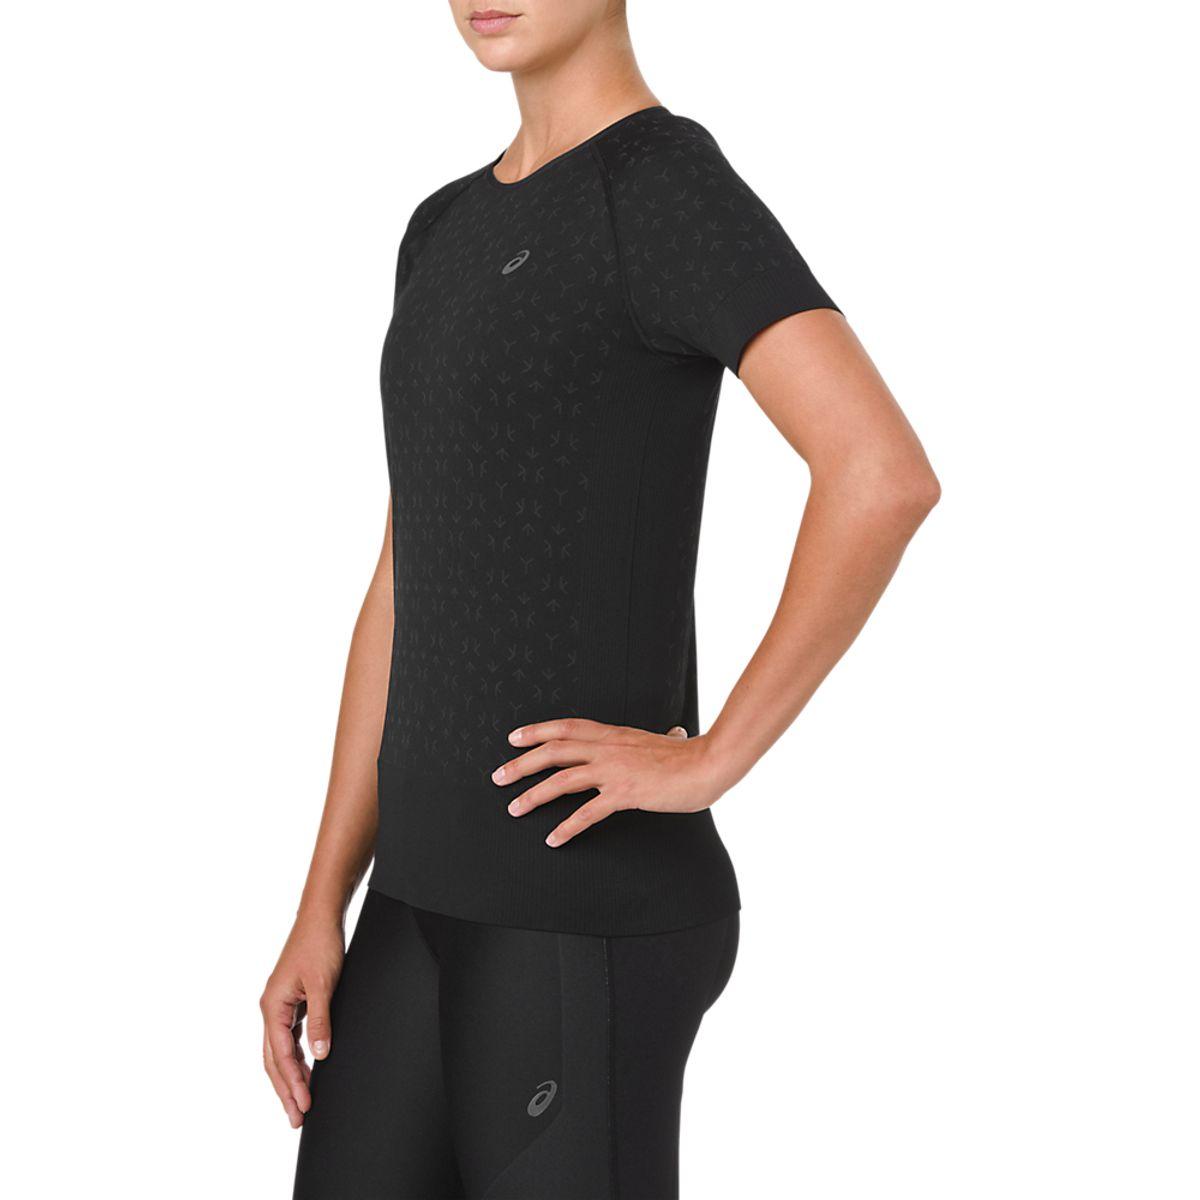 Camiseta-Asics-Short-Sleeve---Feminino---Preto